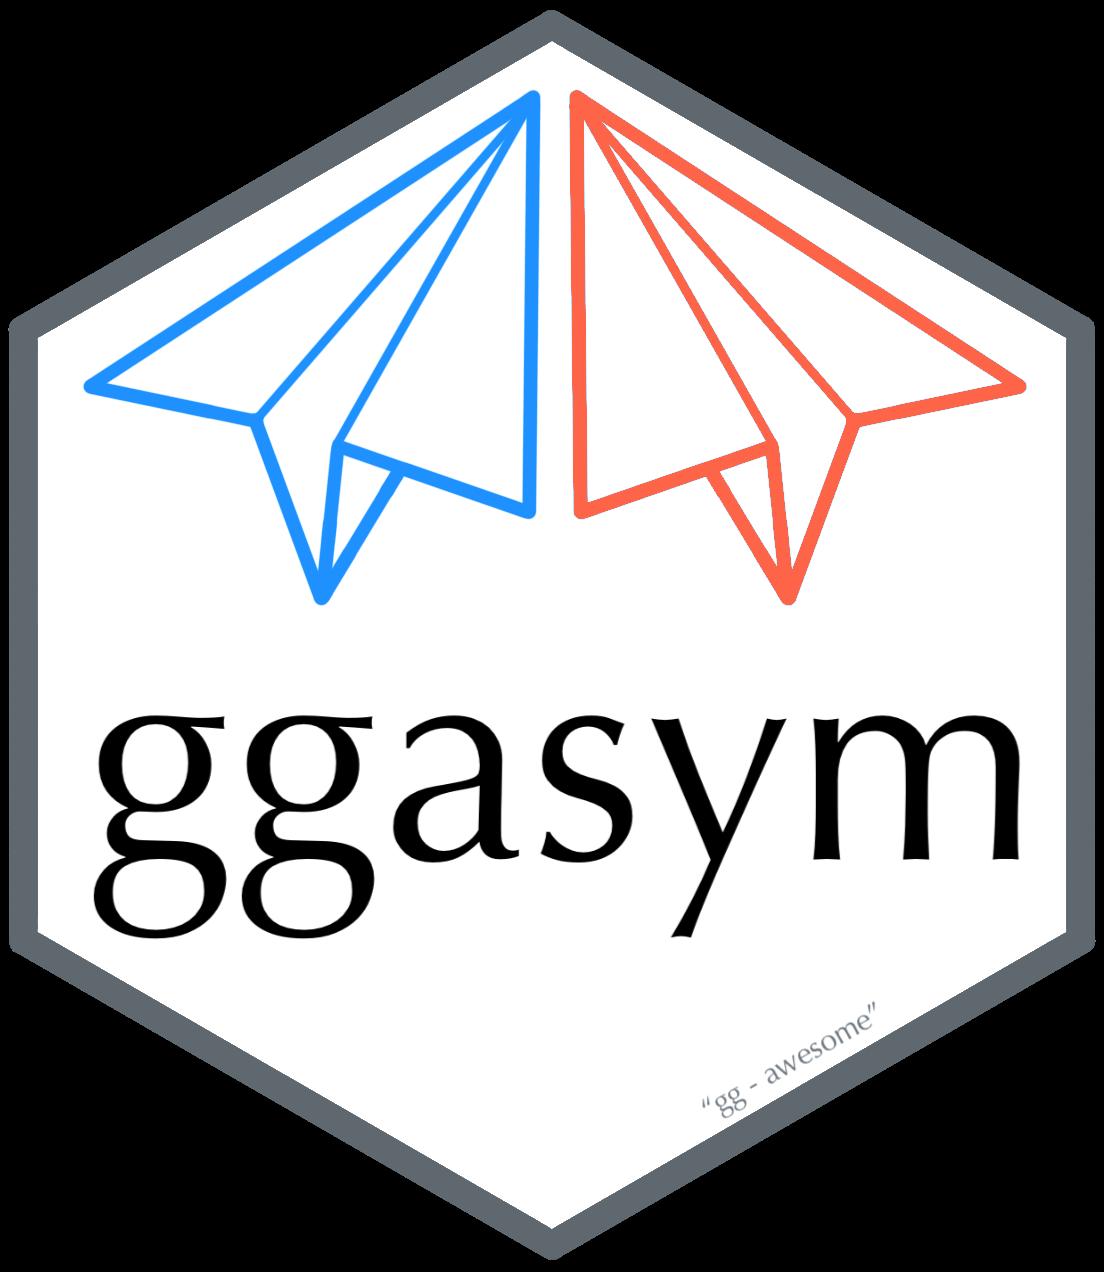 ggasym_logo.png